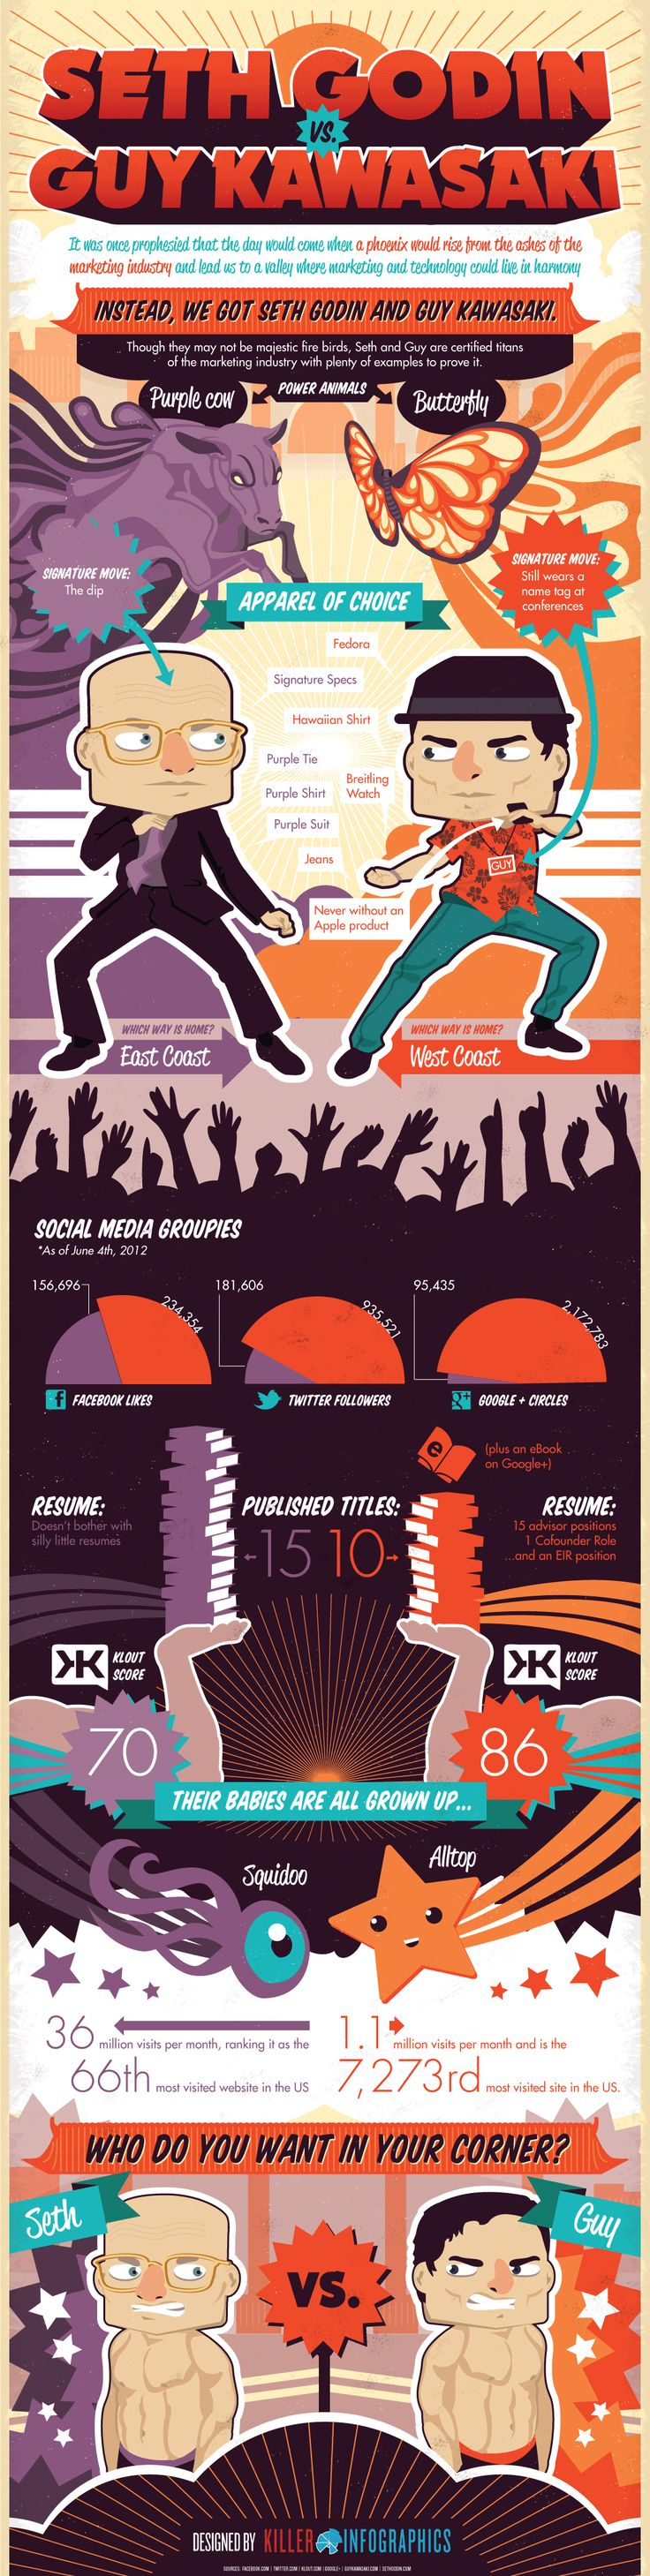 Seth Godin vs Guy Kawasaki.  In the ring of social media marketing who do you want in your corner? Answer: BOTH